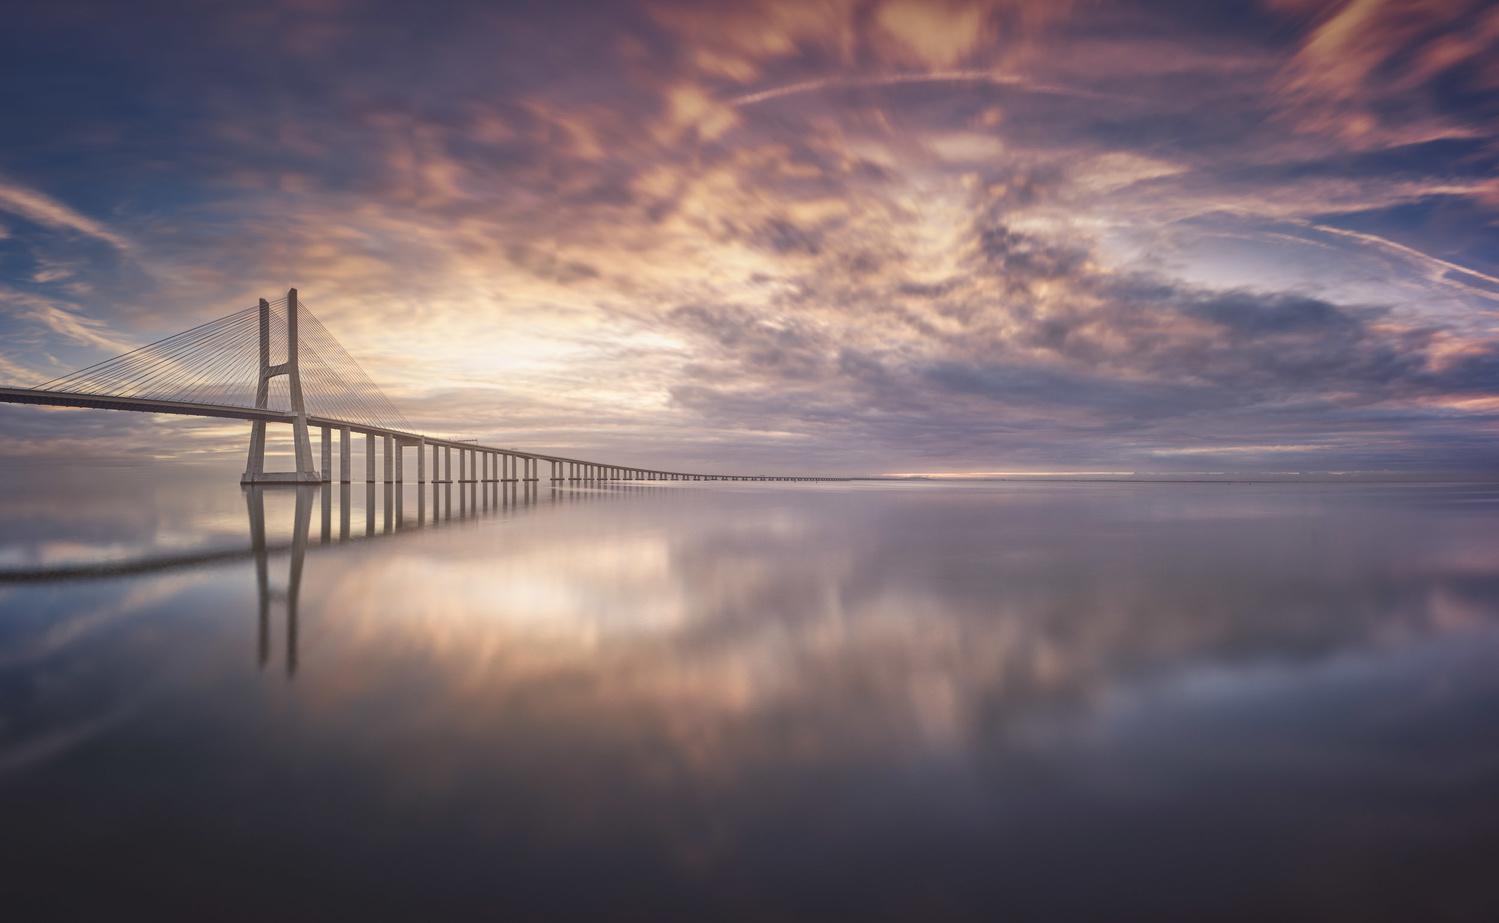 Bridgte to the infinity by Daniel Viñé